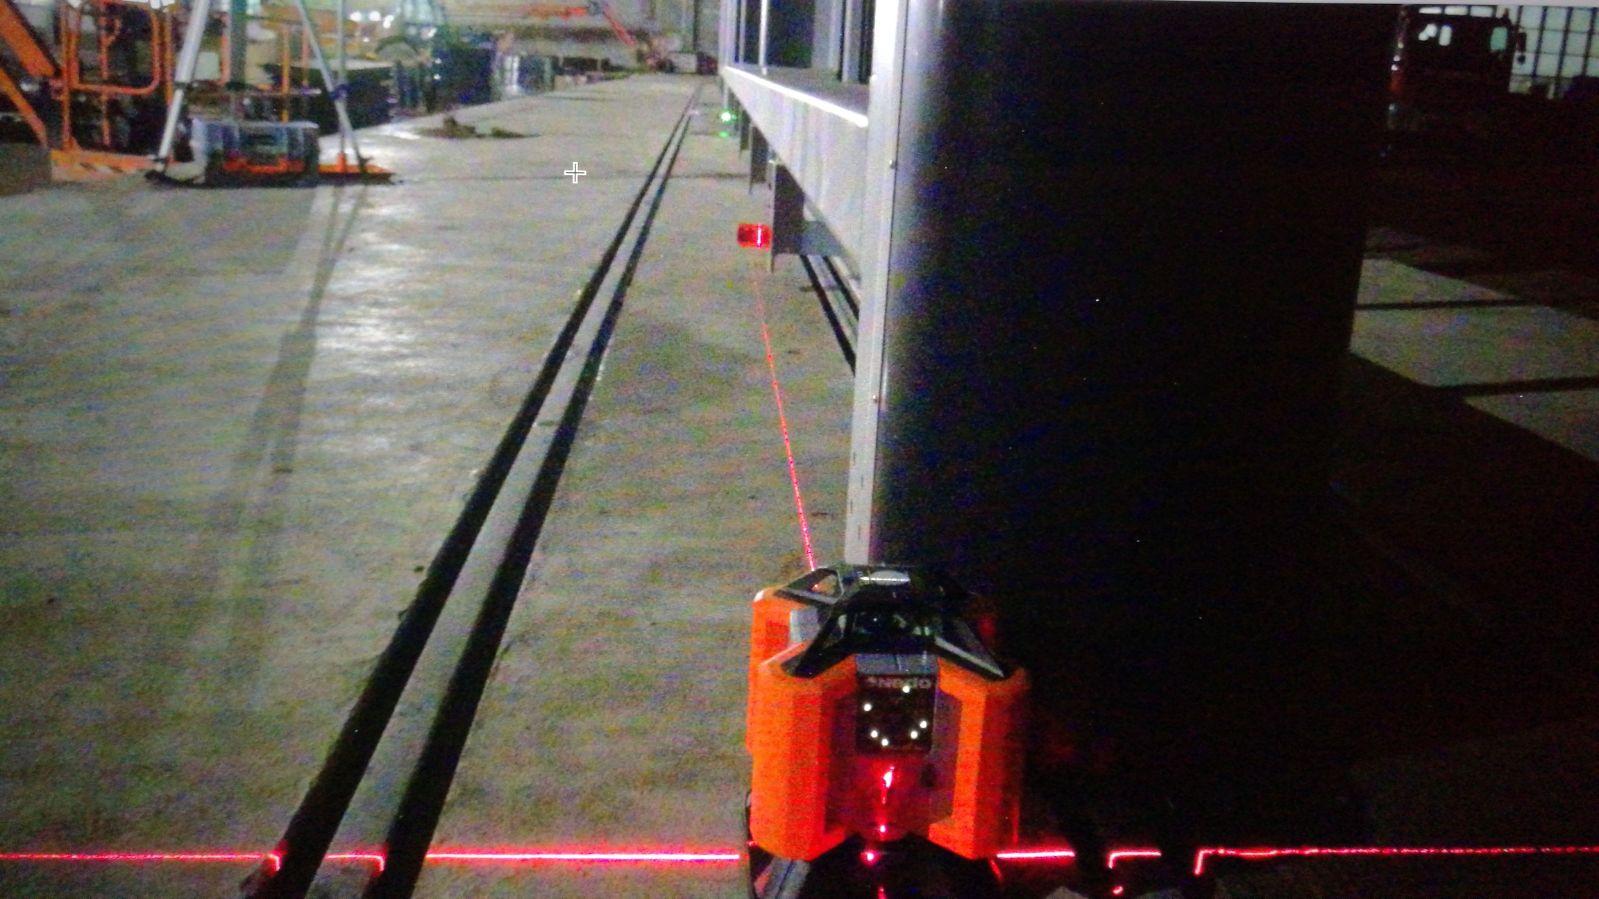 Laser Entfernungsmesser Wiki : Laser entfernungsmesser wiki stabila ld